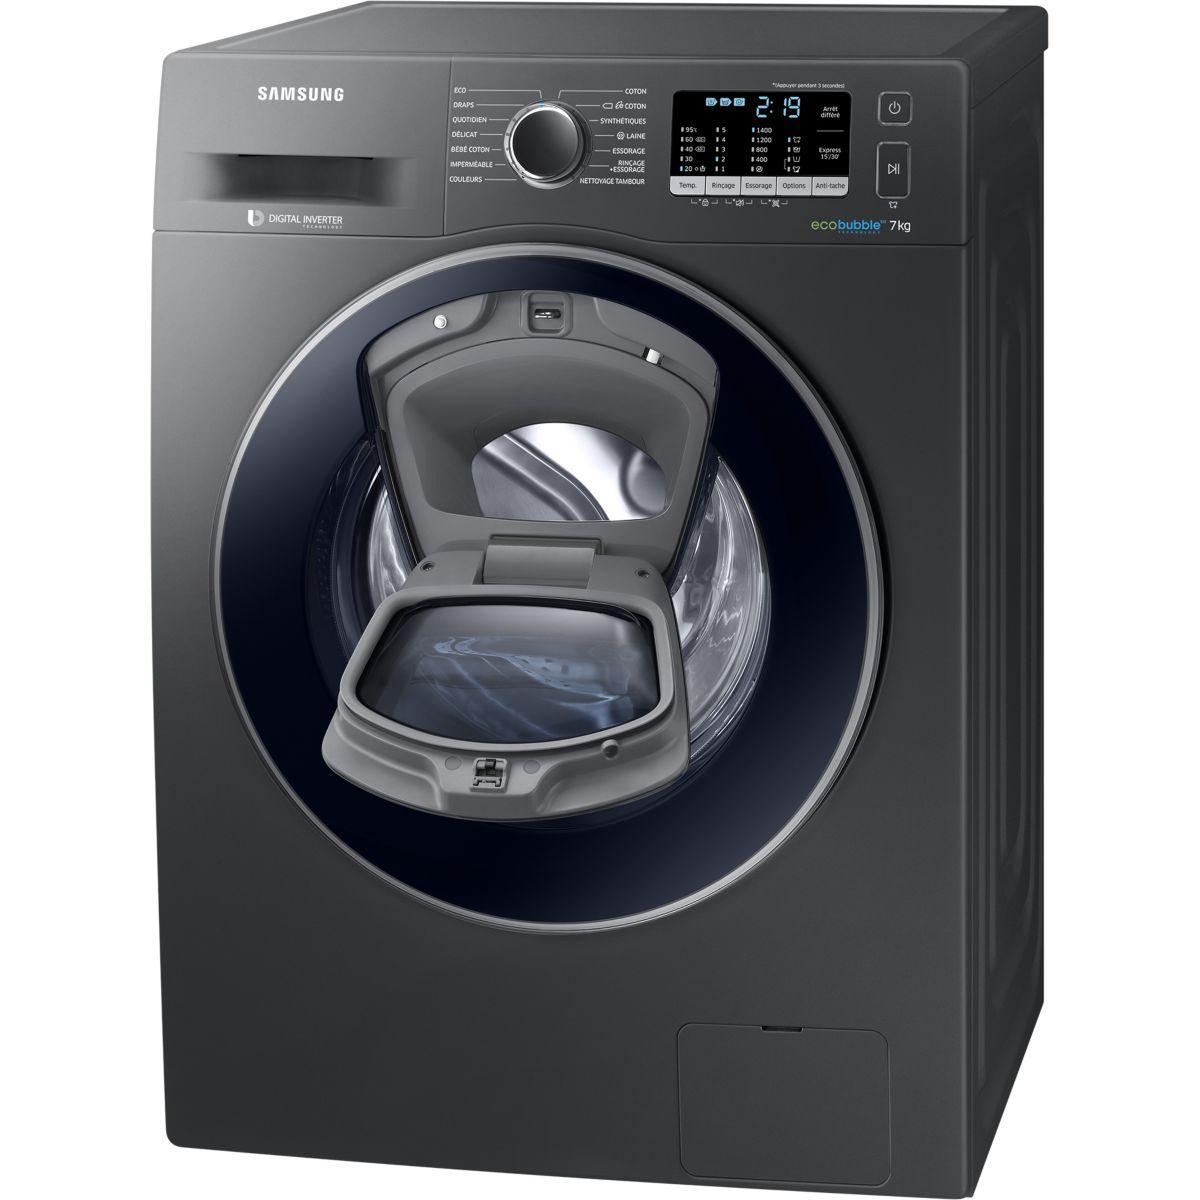 lave linge hublot samsung ww70k5410ux addwash partir de 442 webdistrib - Samsung Ww8ek6415sw Add Wash